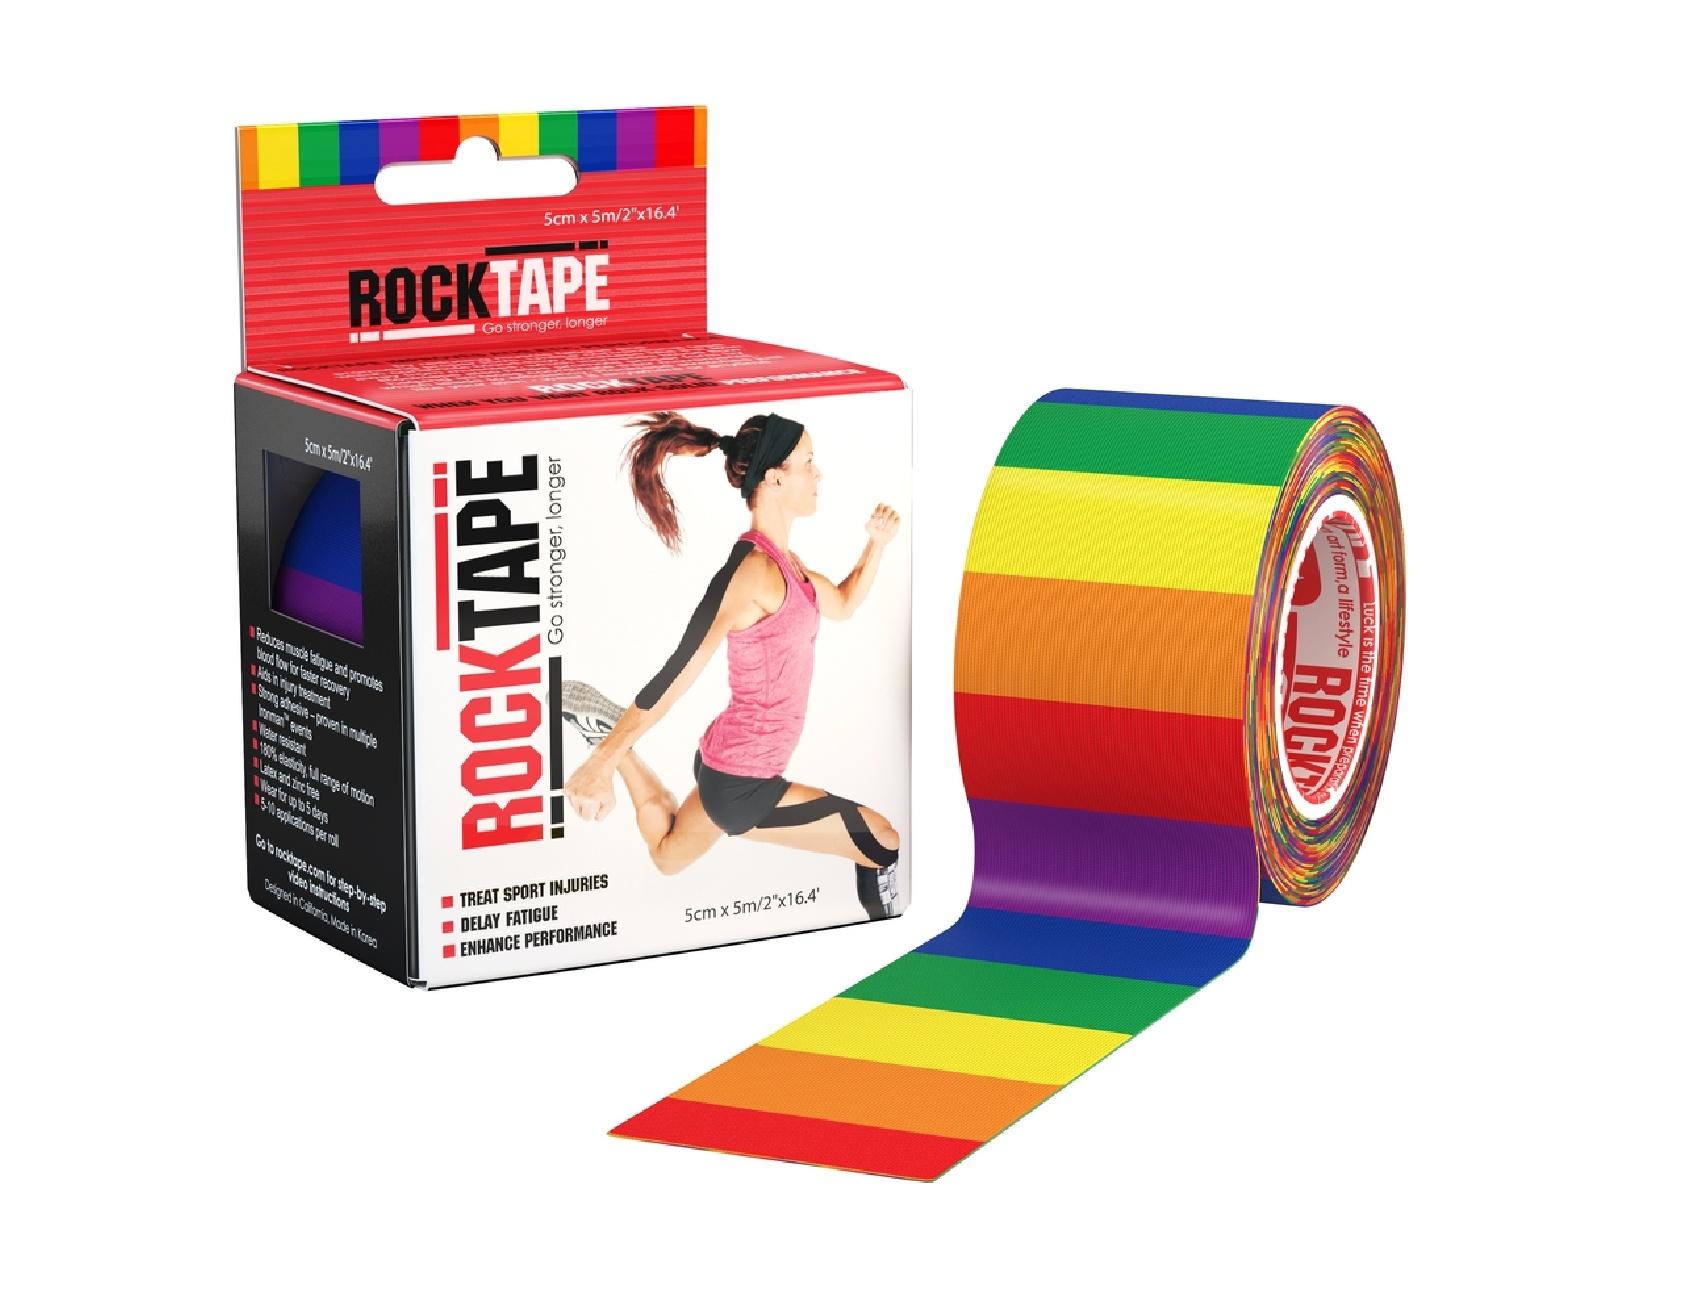 "RockTape 2"" Wide Single Roll And Cardboard Dispenser Box Rainbow Base Image"